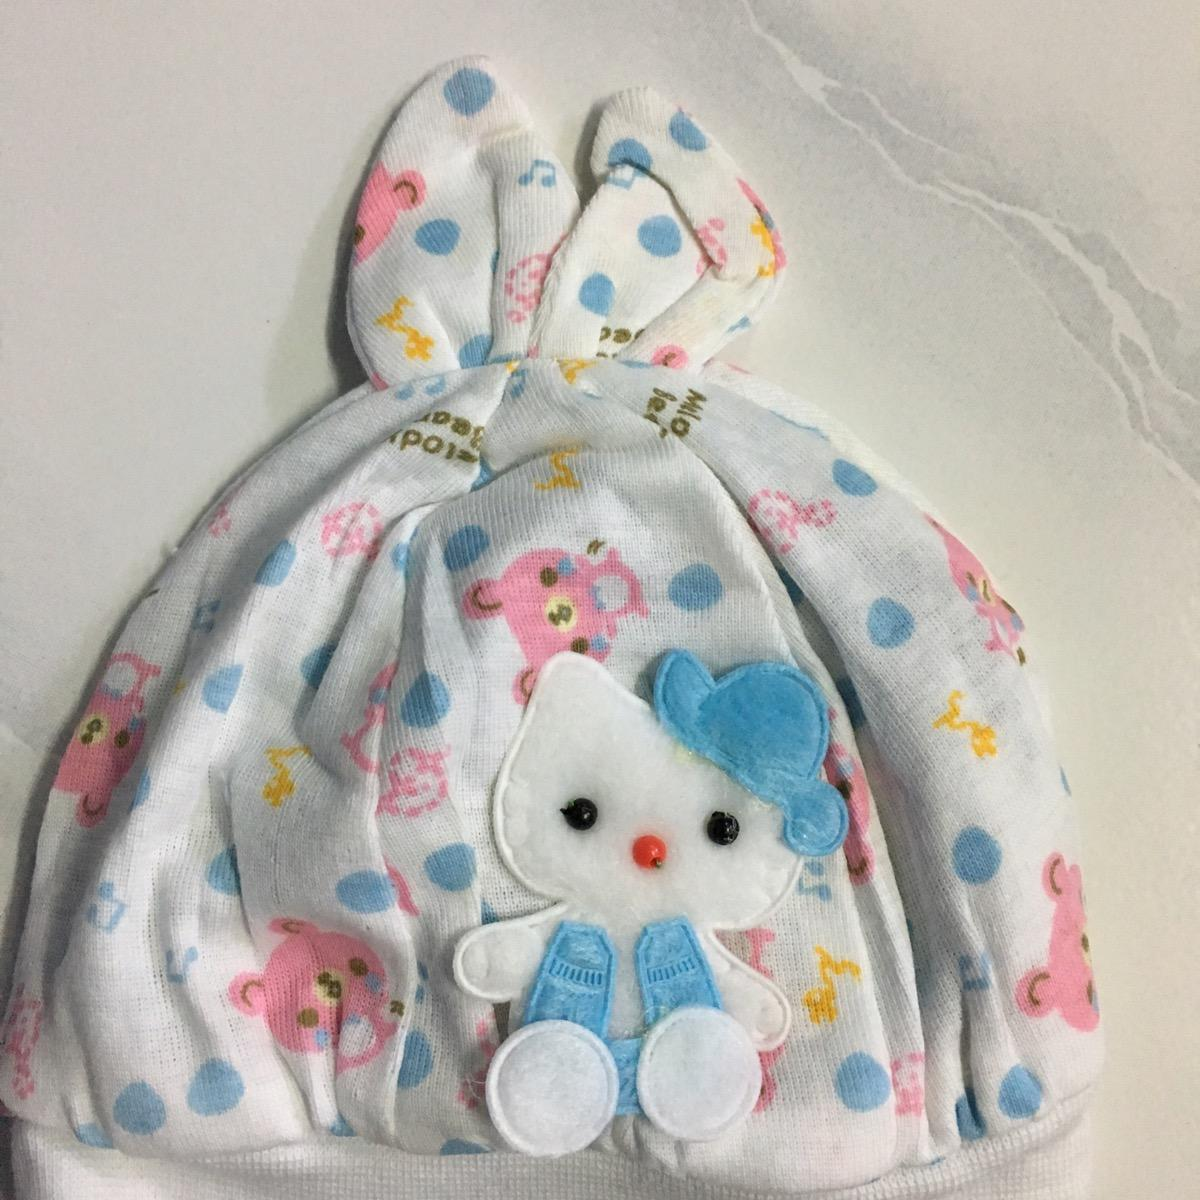 Beneva-topi bayi perempuan-topi bayi baru lahir-newborn-topi bayi